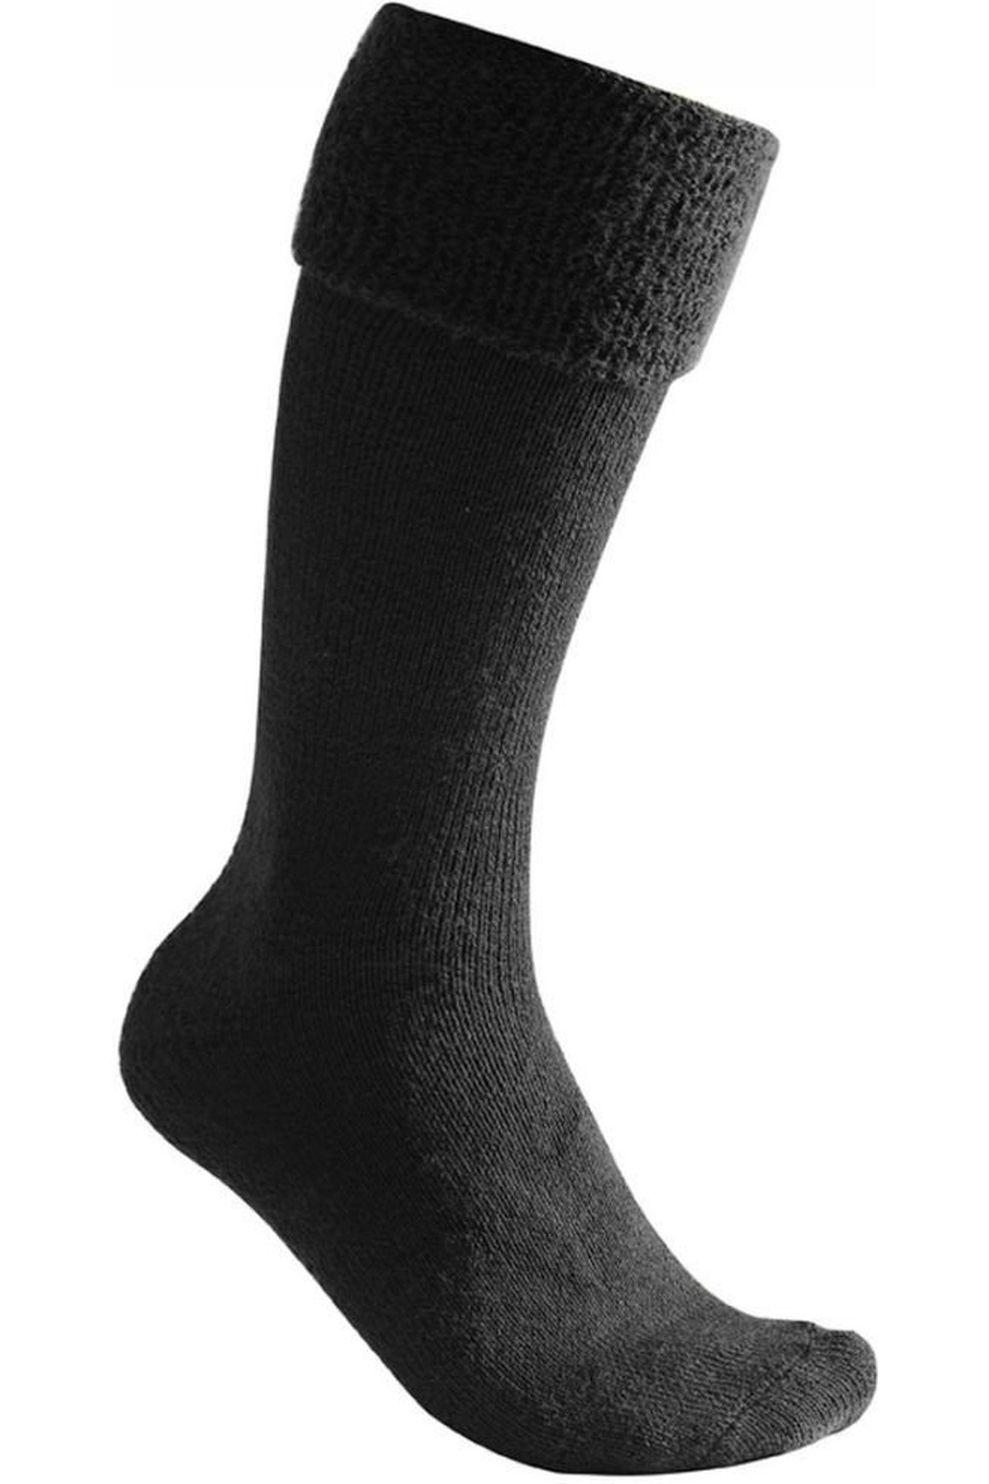 Woolpower Kous Knee-High 600 (very warm everyday sock) - Zwart - Maten: 36/39, 45/48